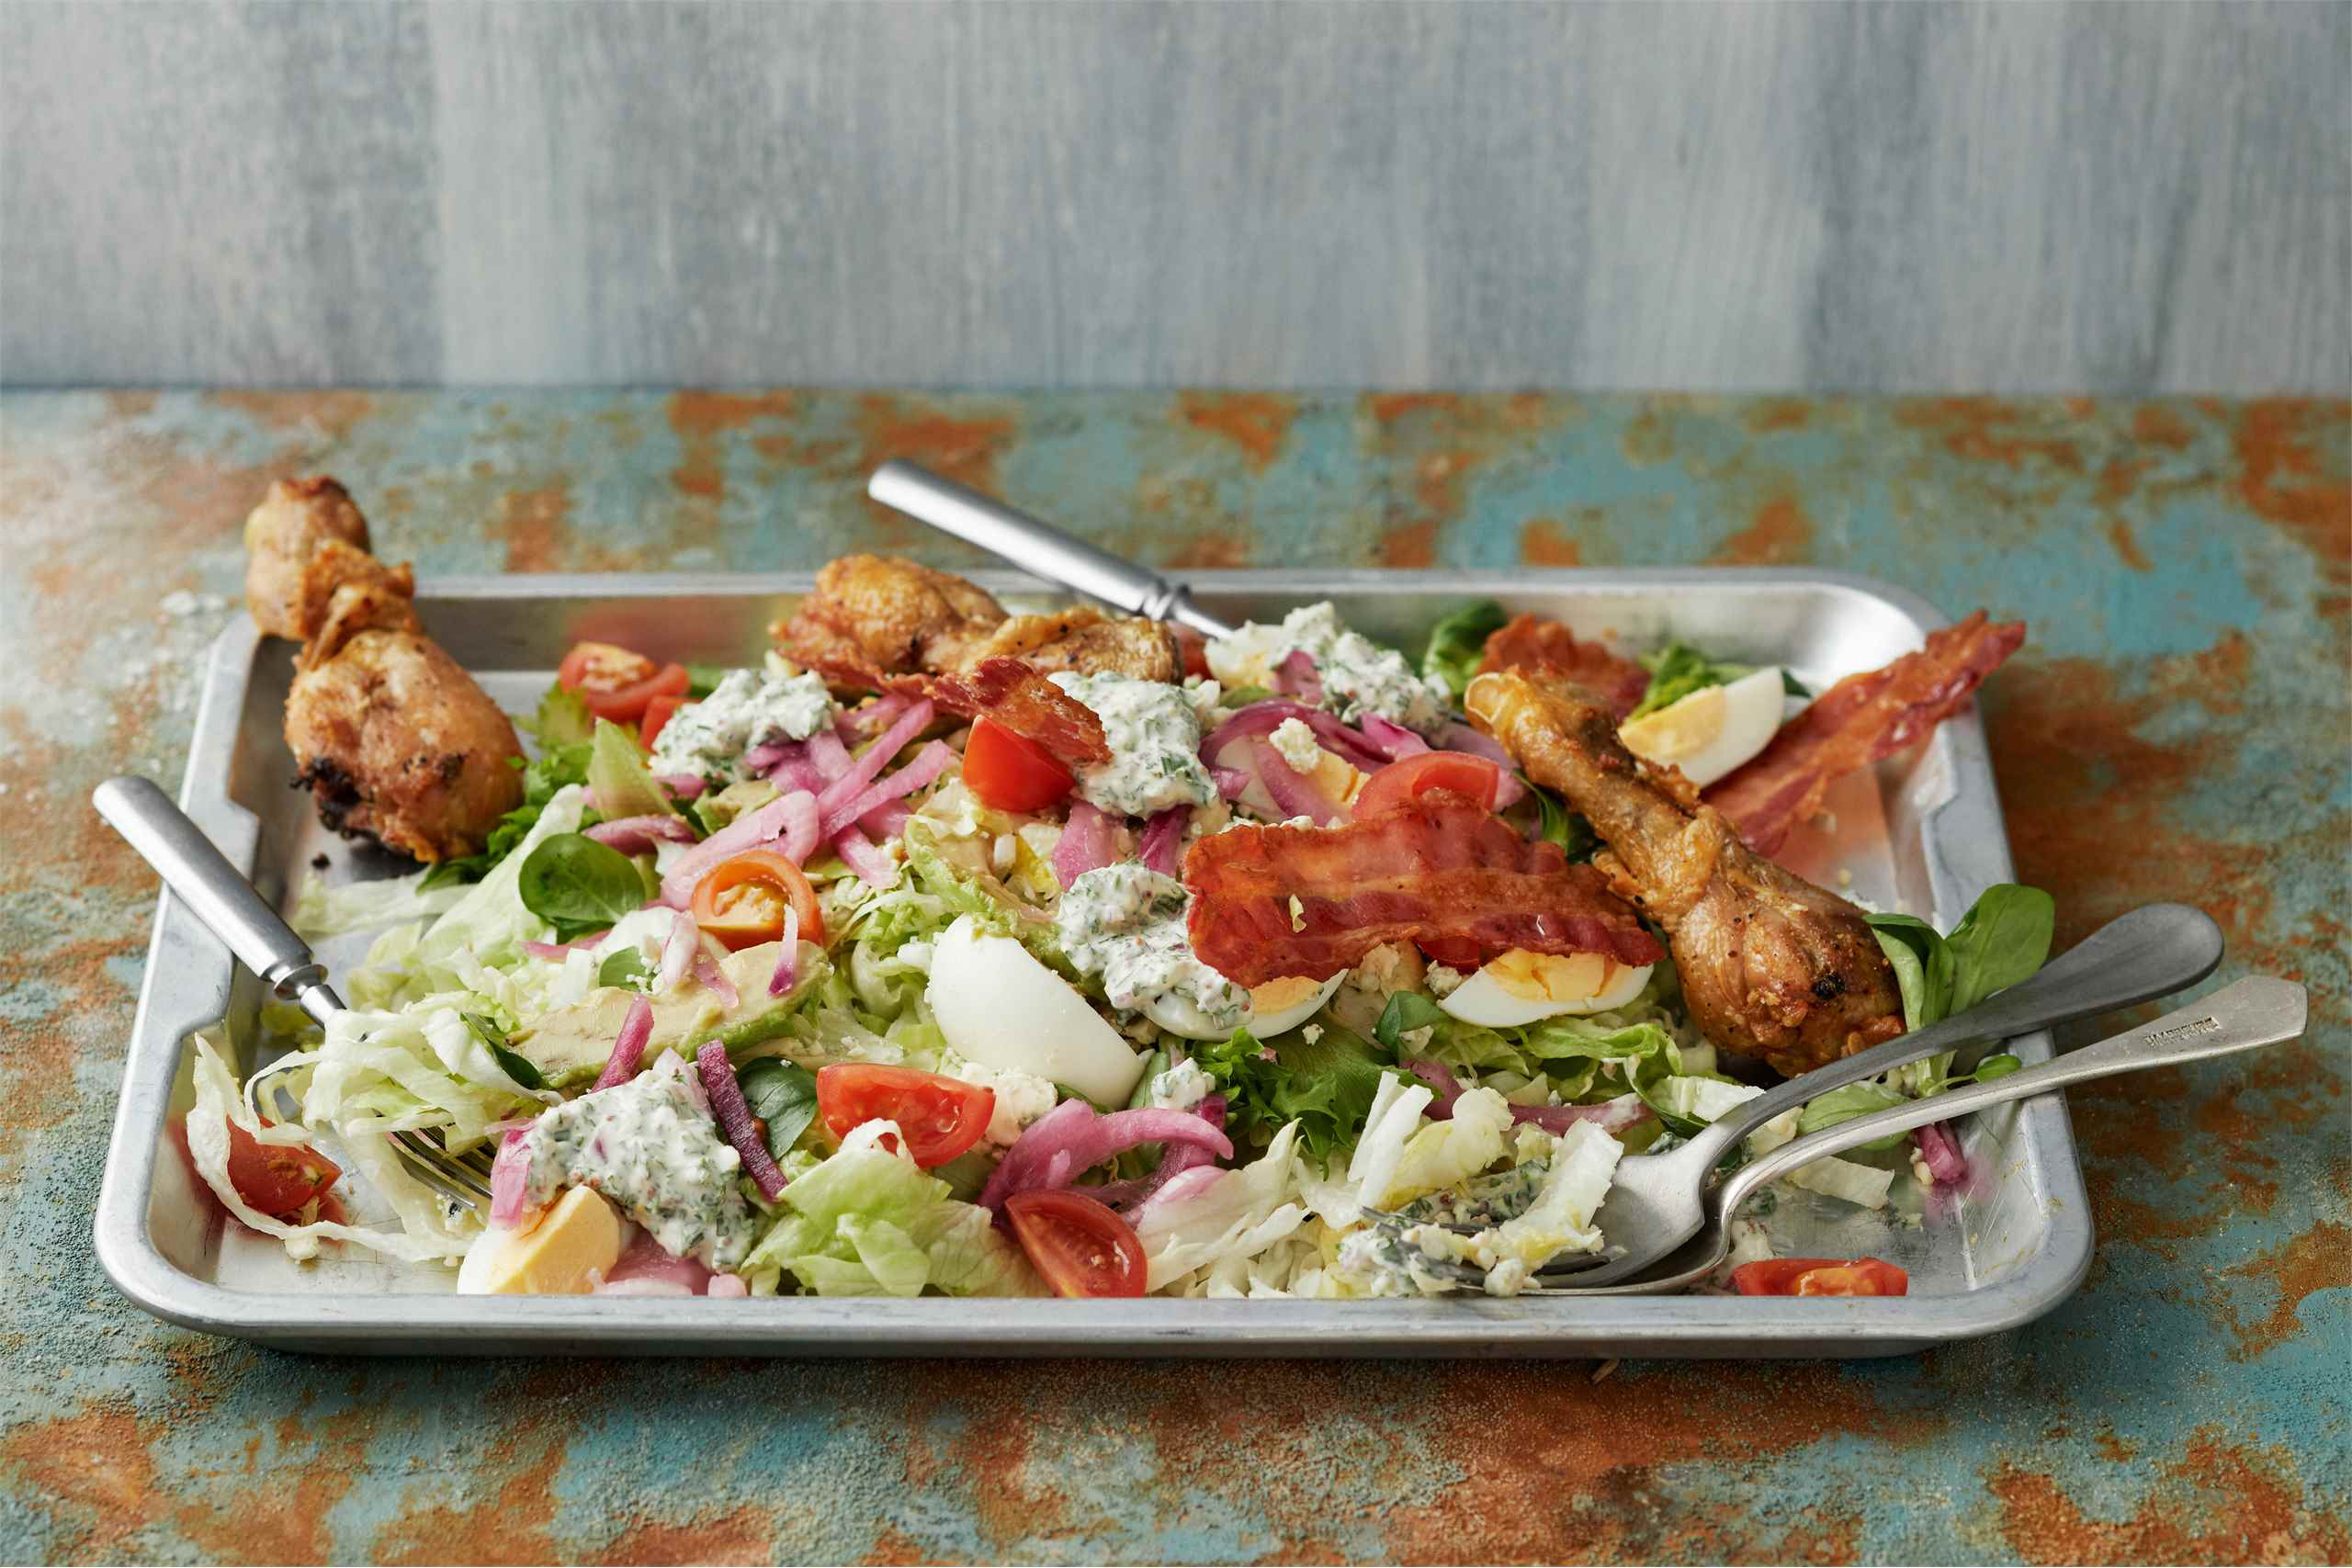 The Cobb-salaatti